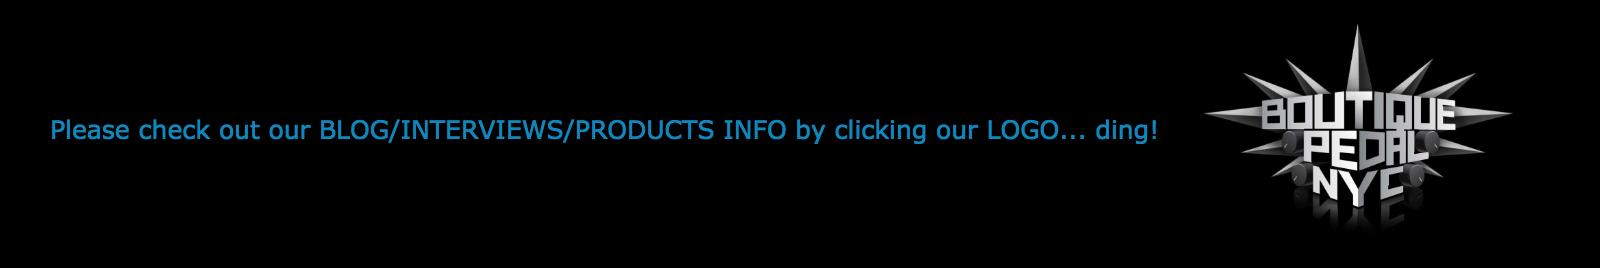 bpnyc-blog-1600x268-sblack-and-blue.jpg